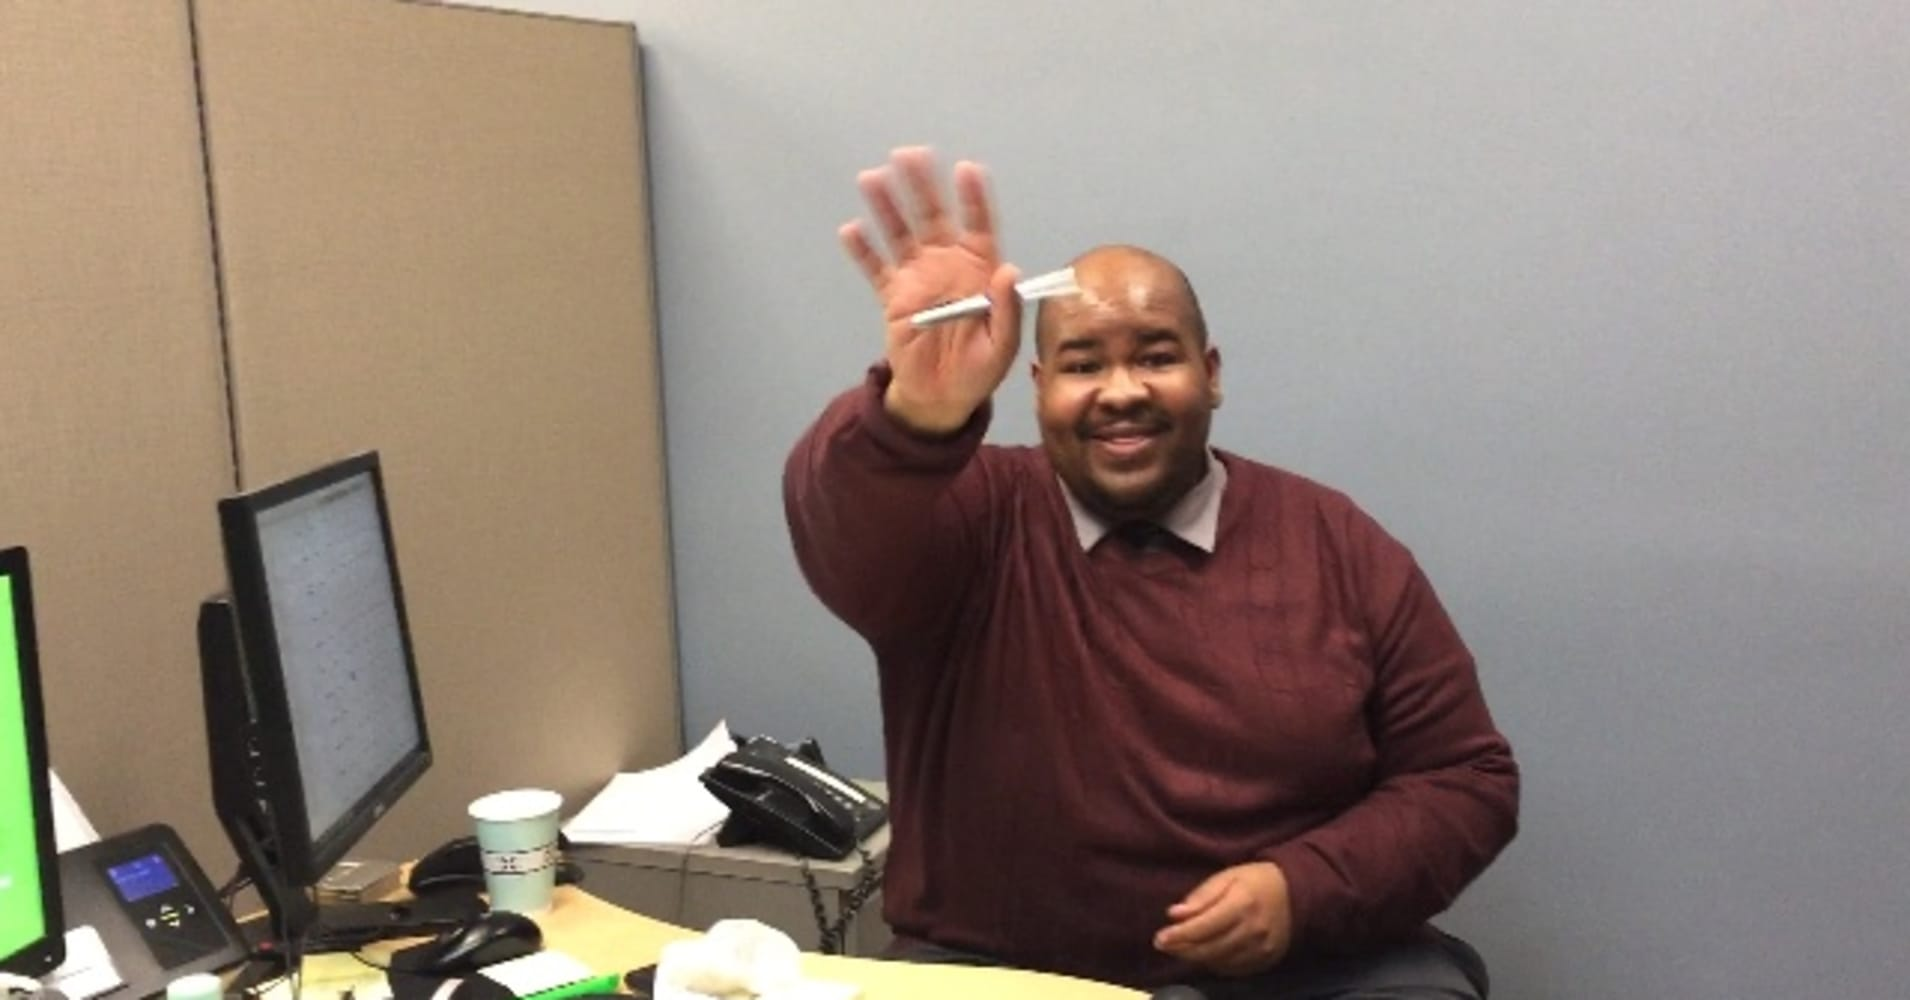 A day in the life of an H&R Block tax pro, who works 11-hour days during tax season